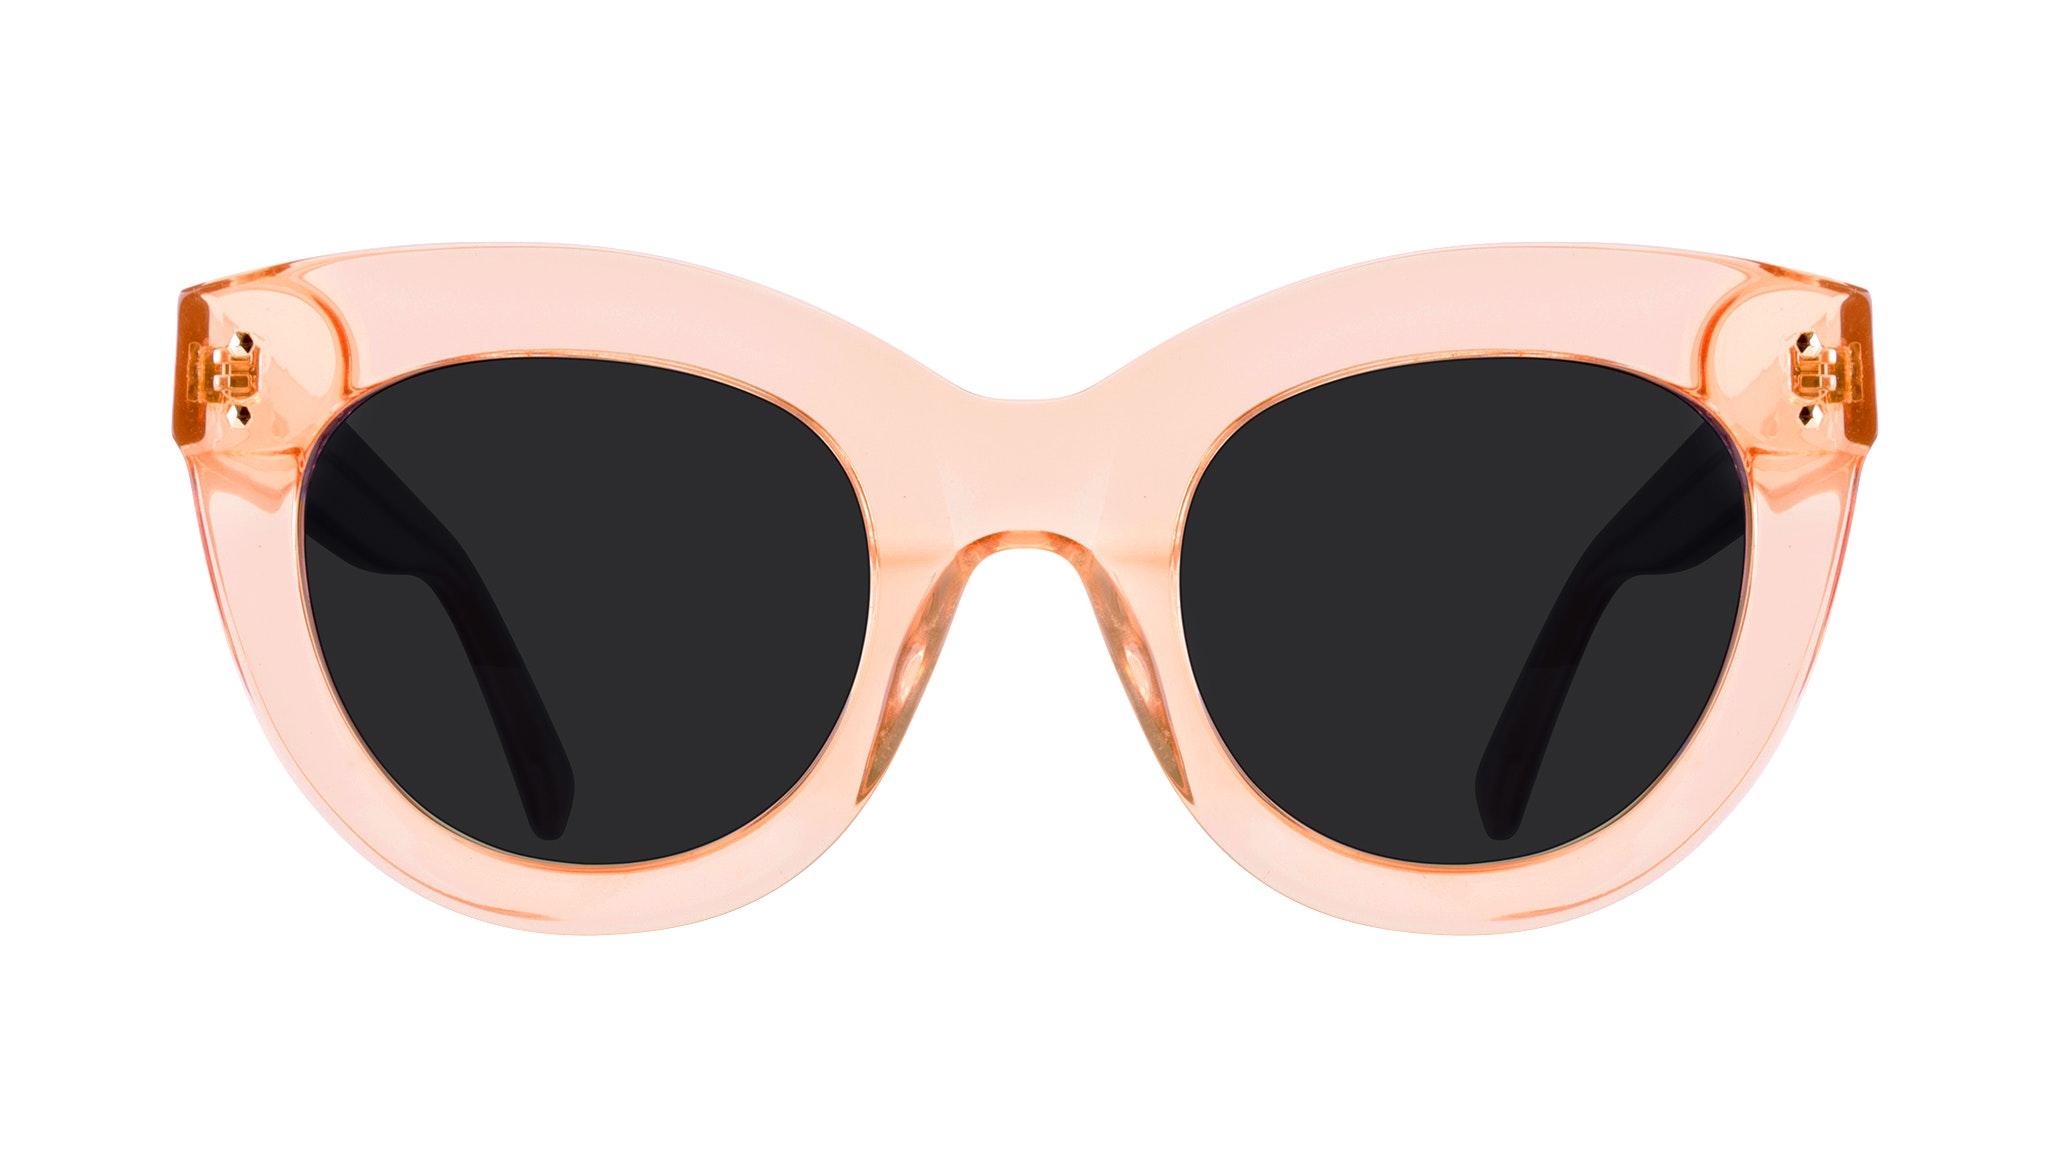 Affordable Fashion Glasses Cat Eye Sunglasses Women Dusk Peach Front